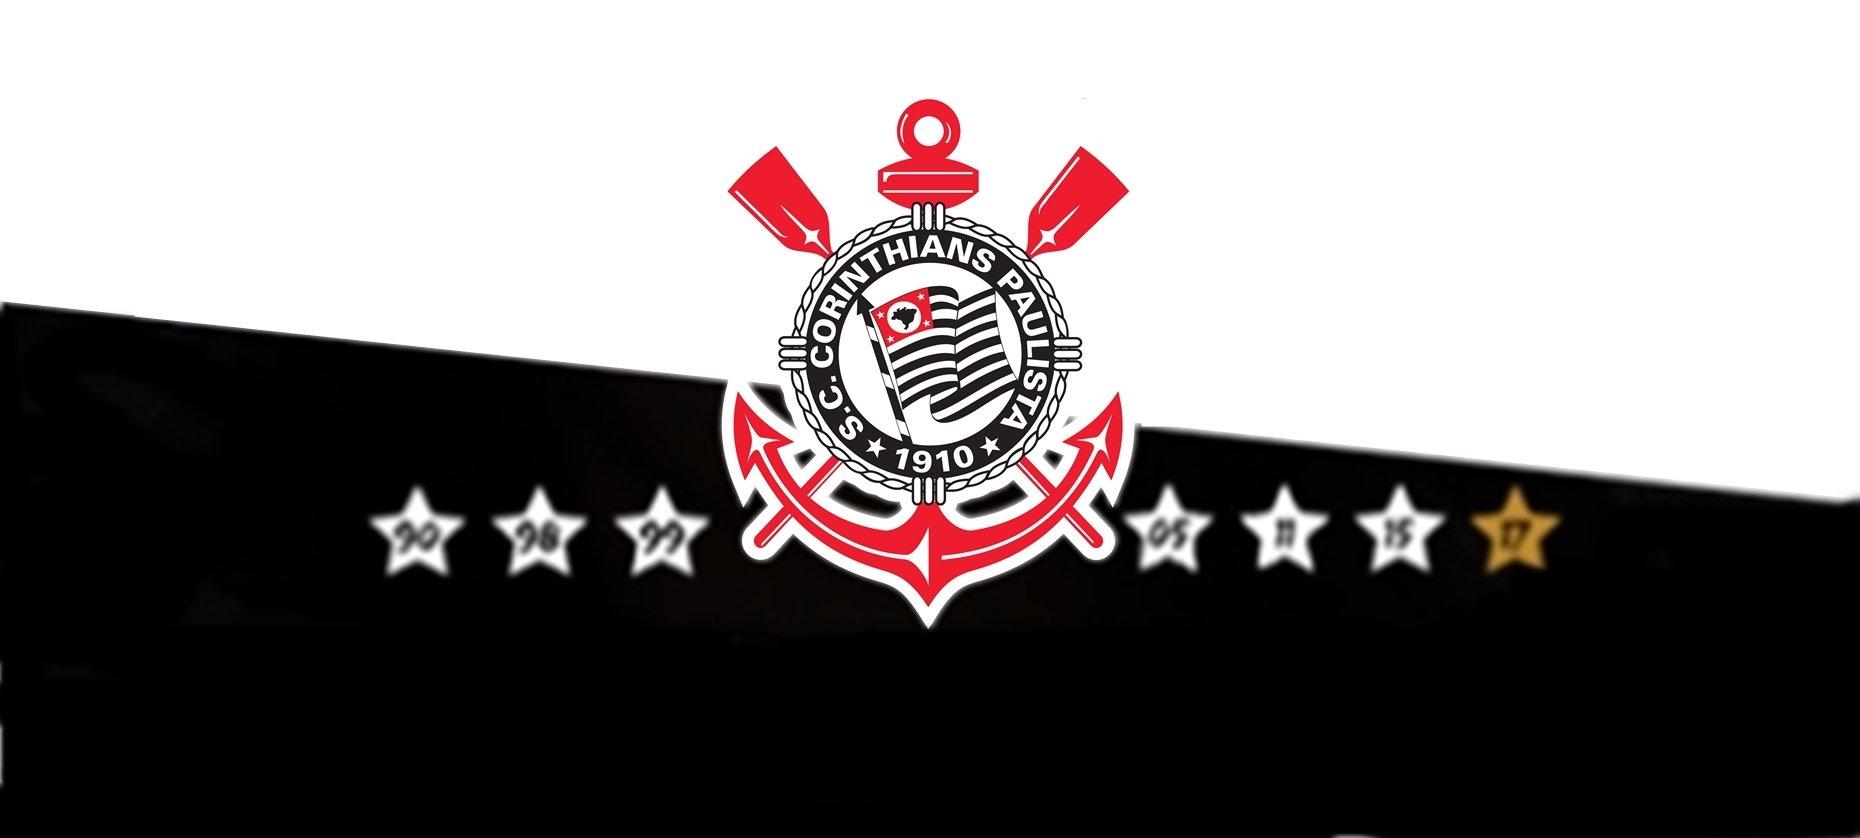 aae9db3e03 Como por o tema do Corinthians na foto de perfil do Facebook